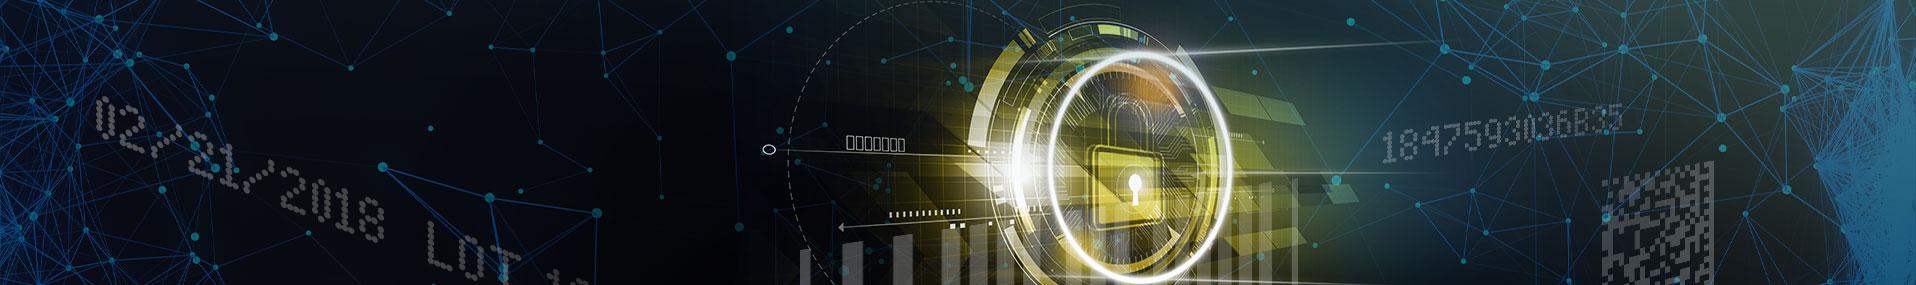 glowing digital security lock on data background